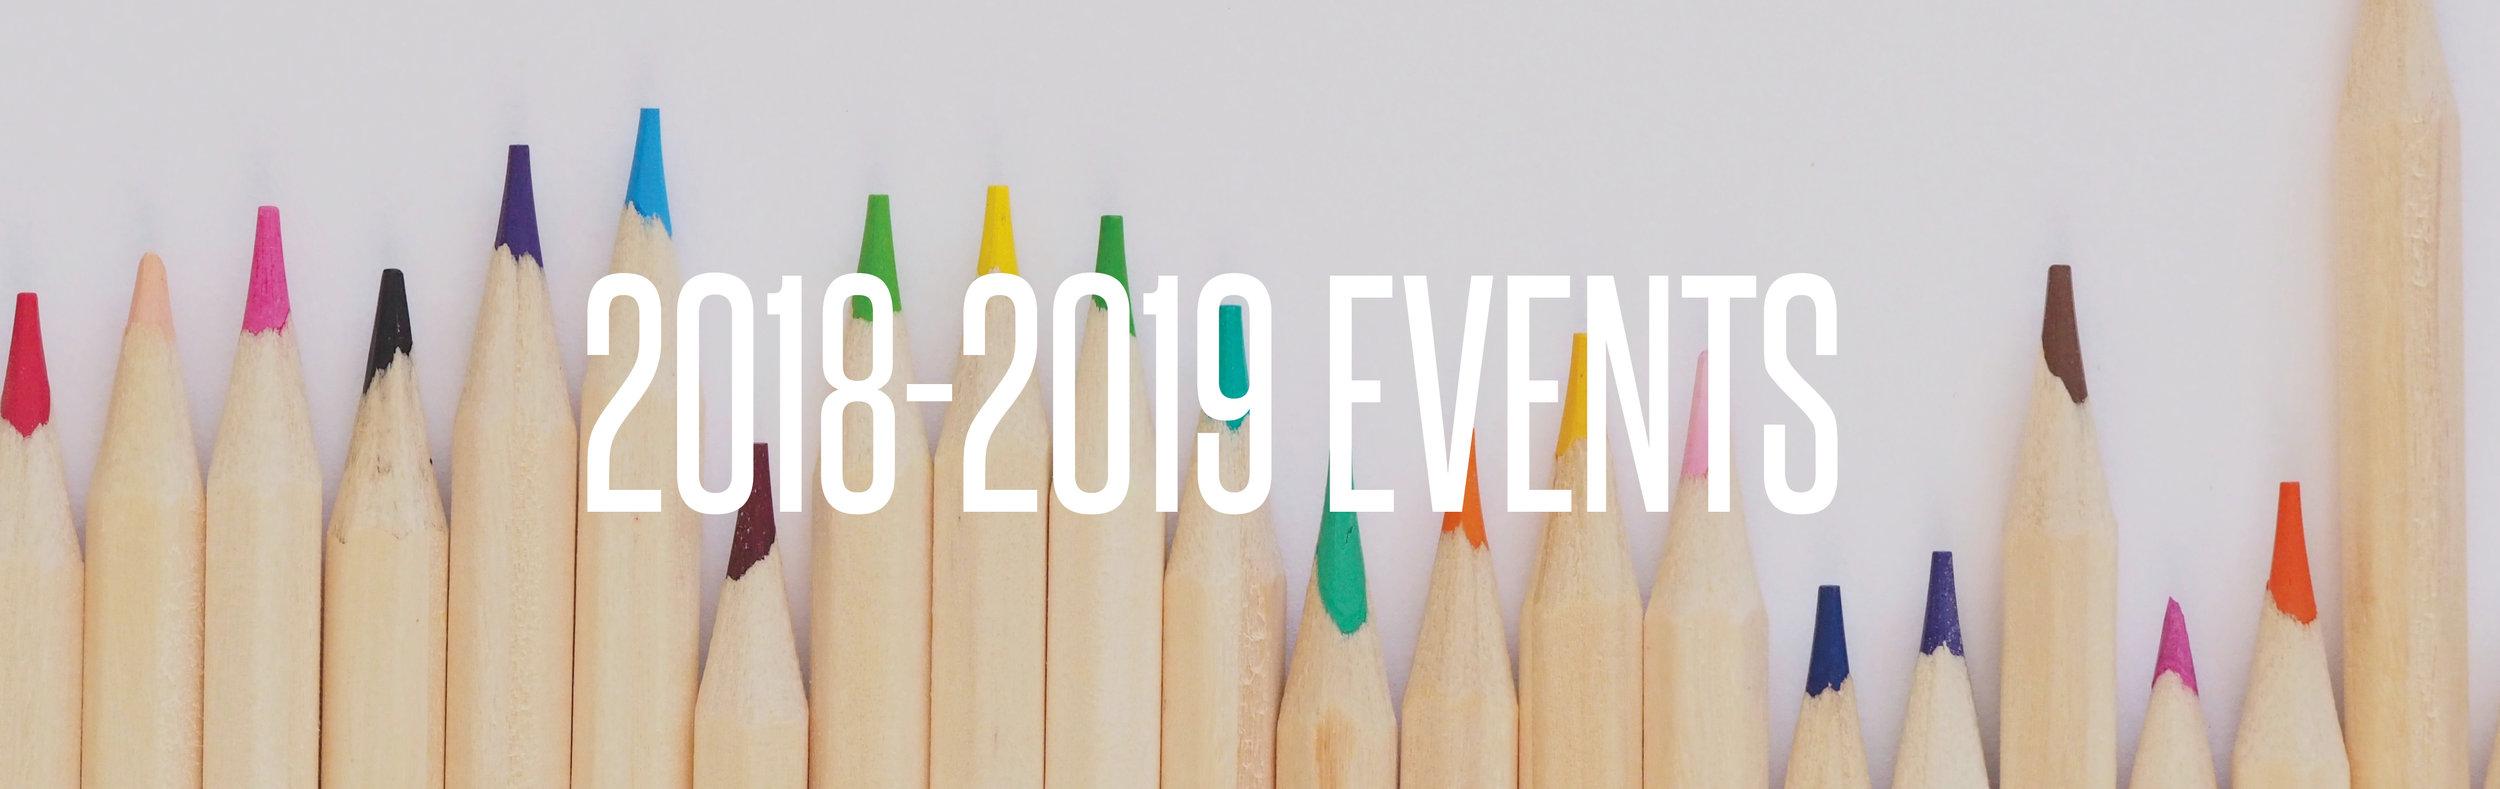 2018=2-19 Events Header.jpg